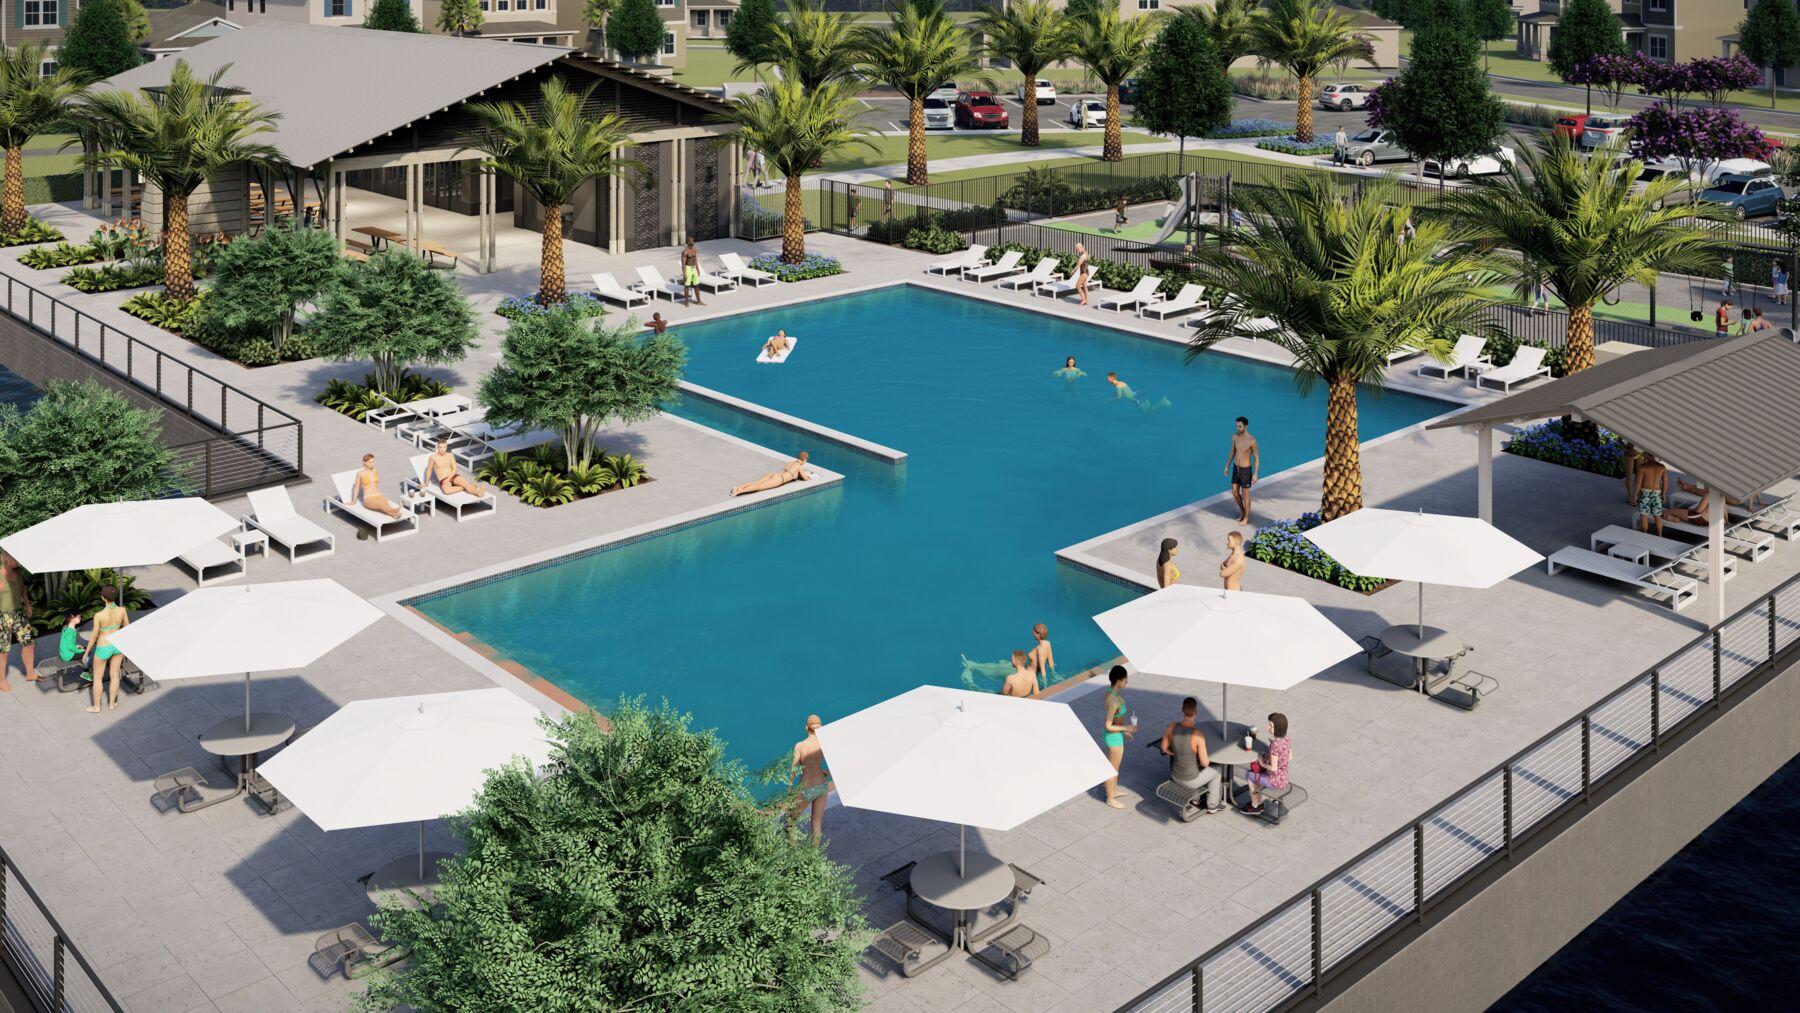 Rivington Community Pool